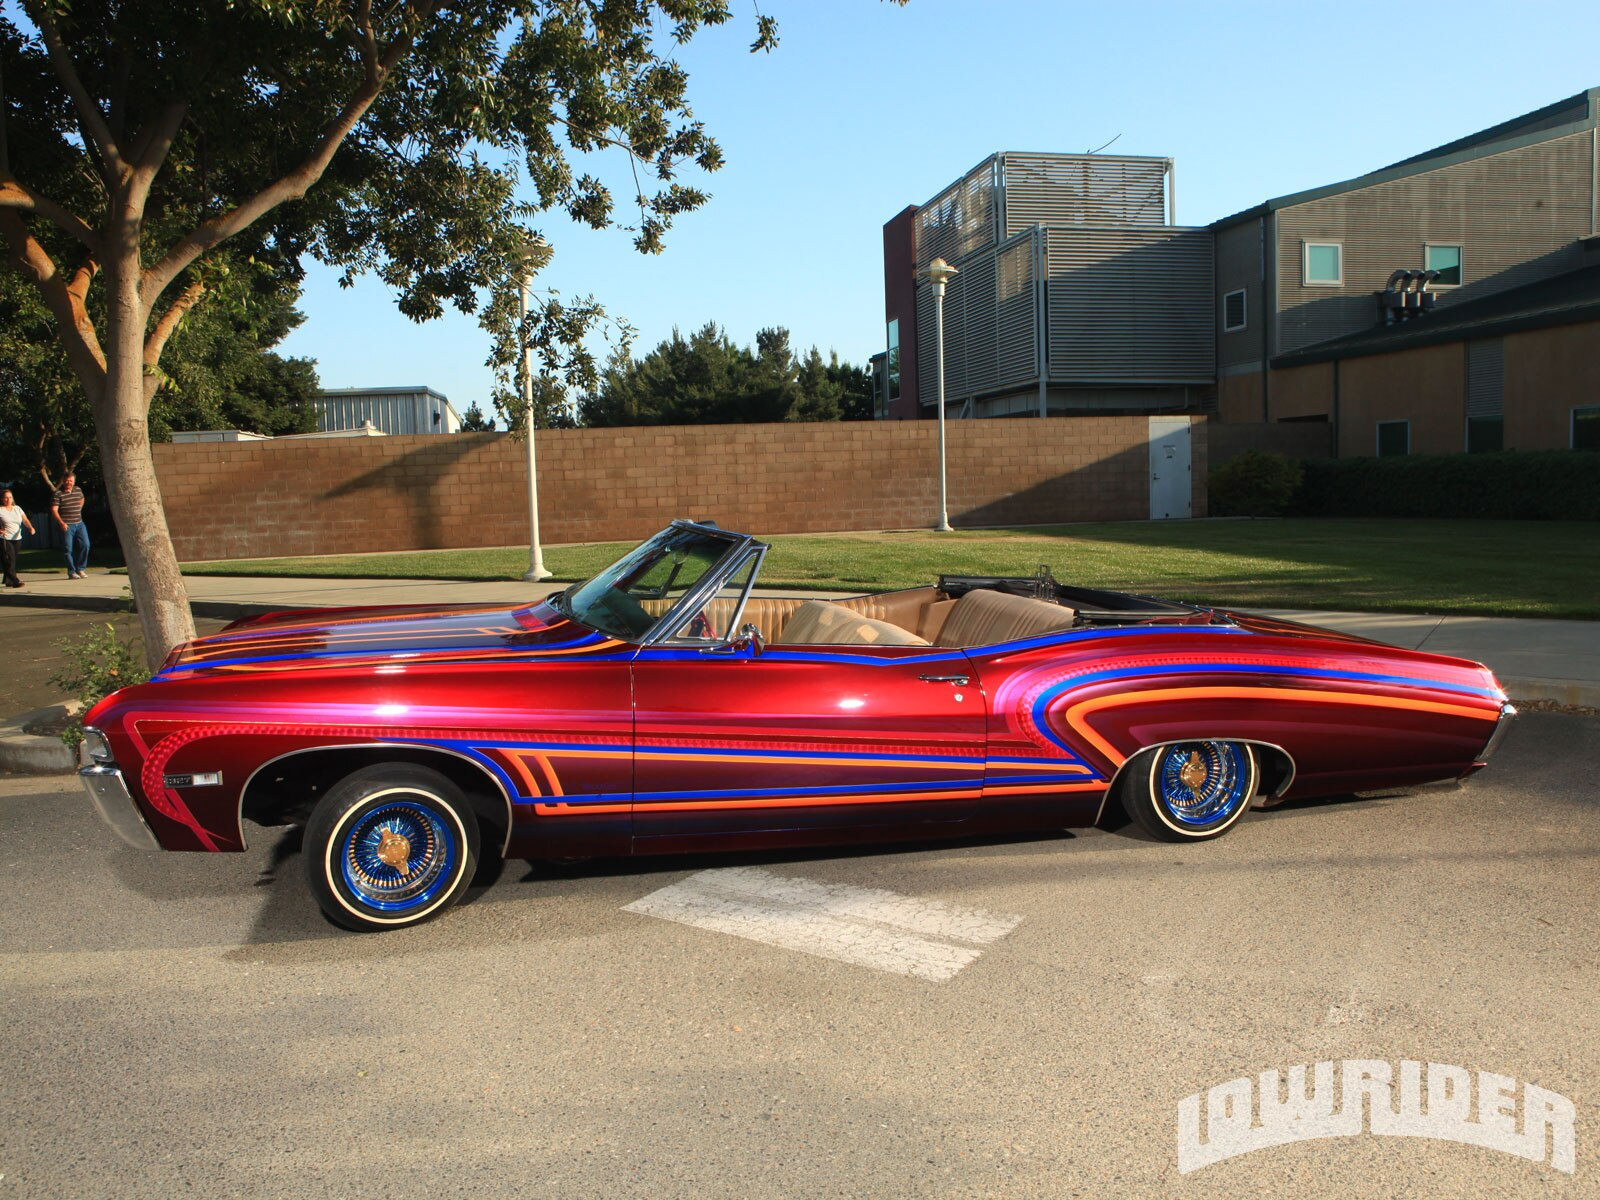 1968 Chevrolet Impala Lowrider Magazine